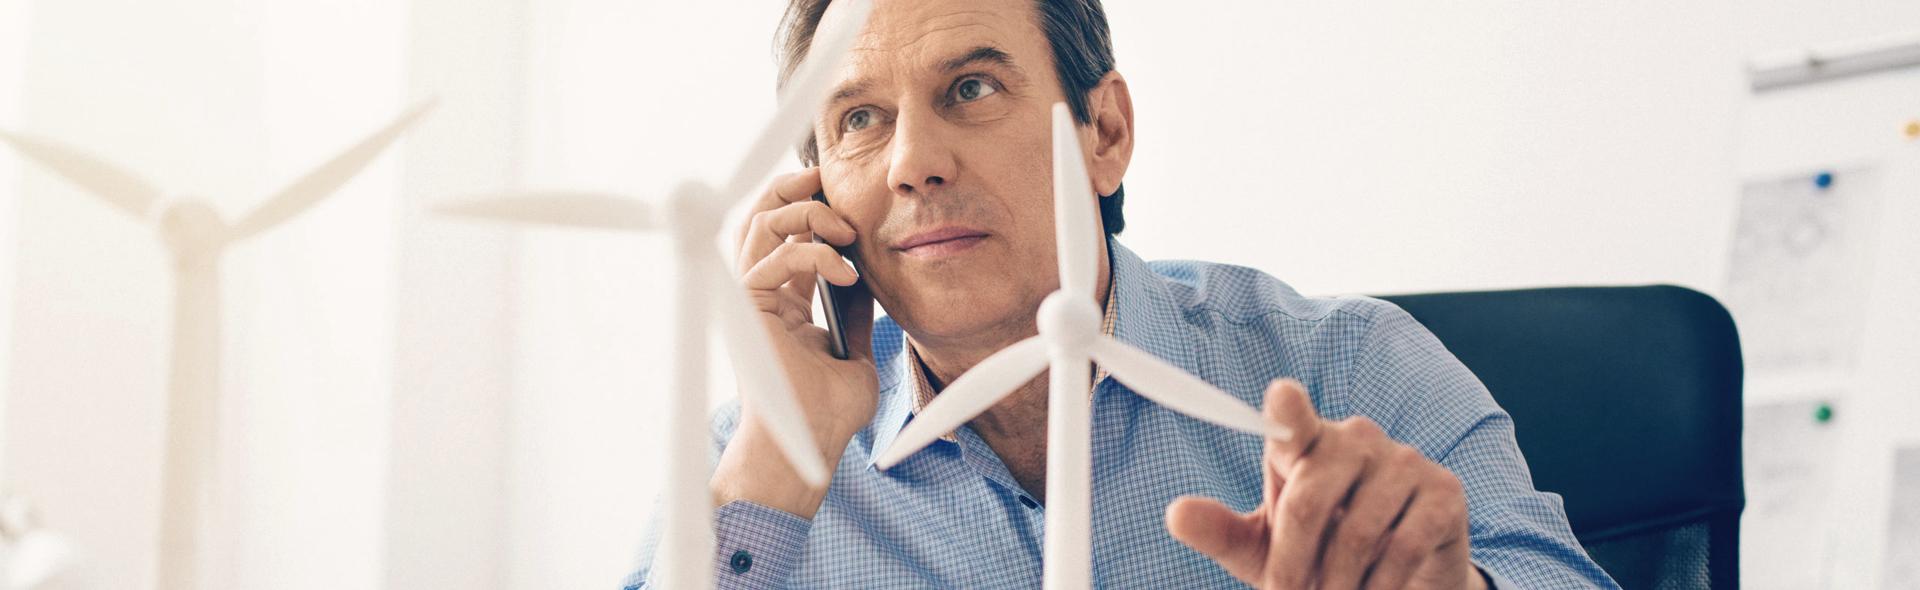 An Alterric employee talks to a customer